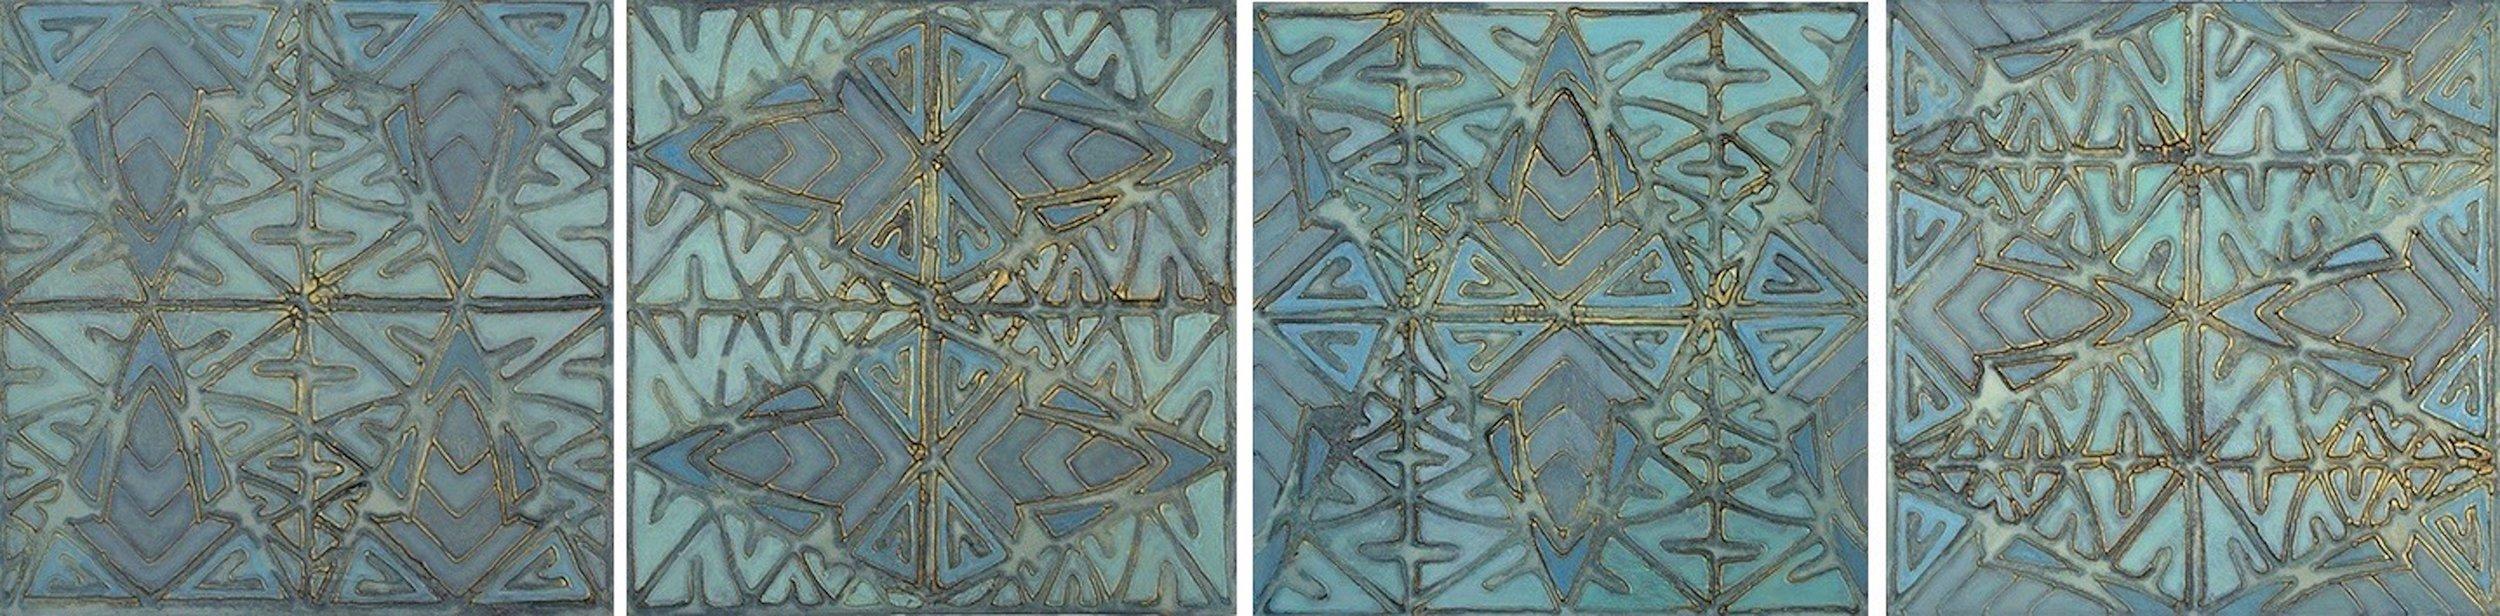 "Tribal Blues 1 - 4 @ 12"" x 12"" x 2"" Acrylic & oil on archival board"